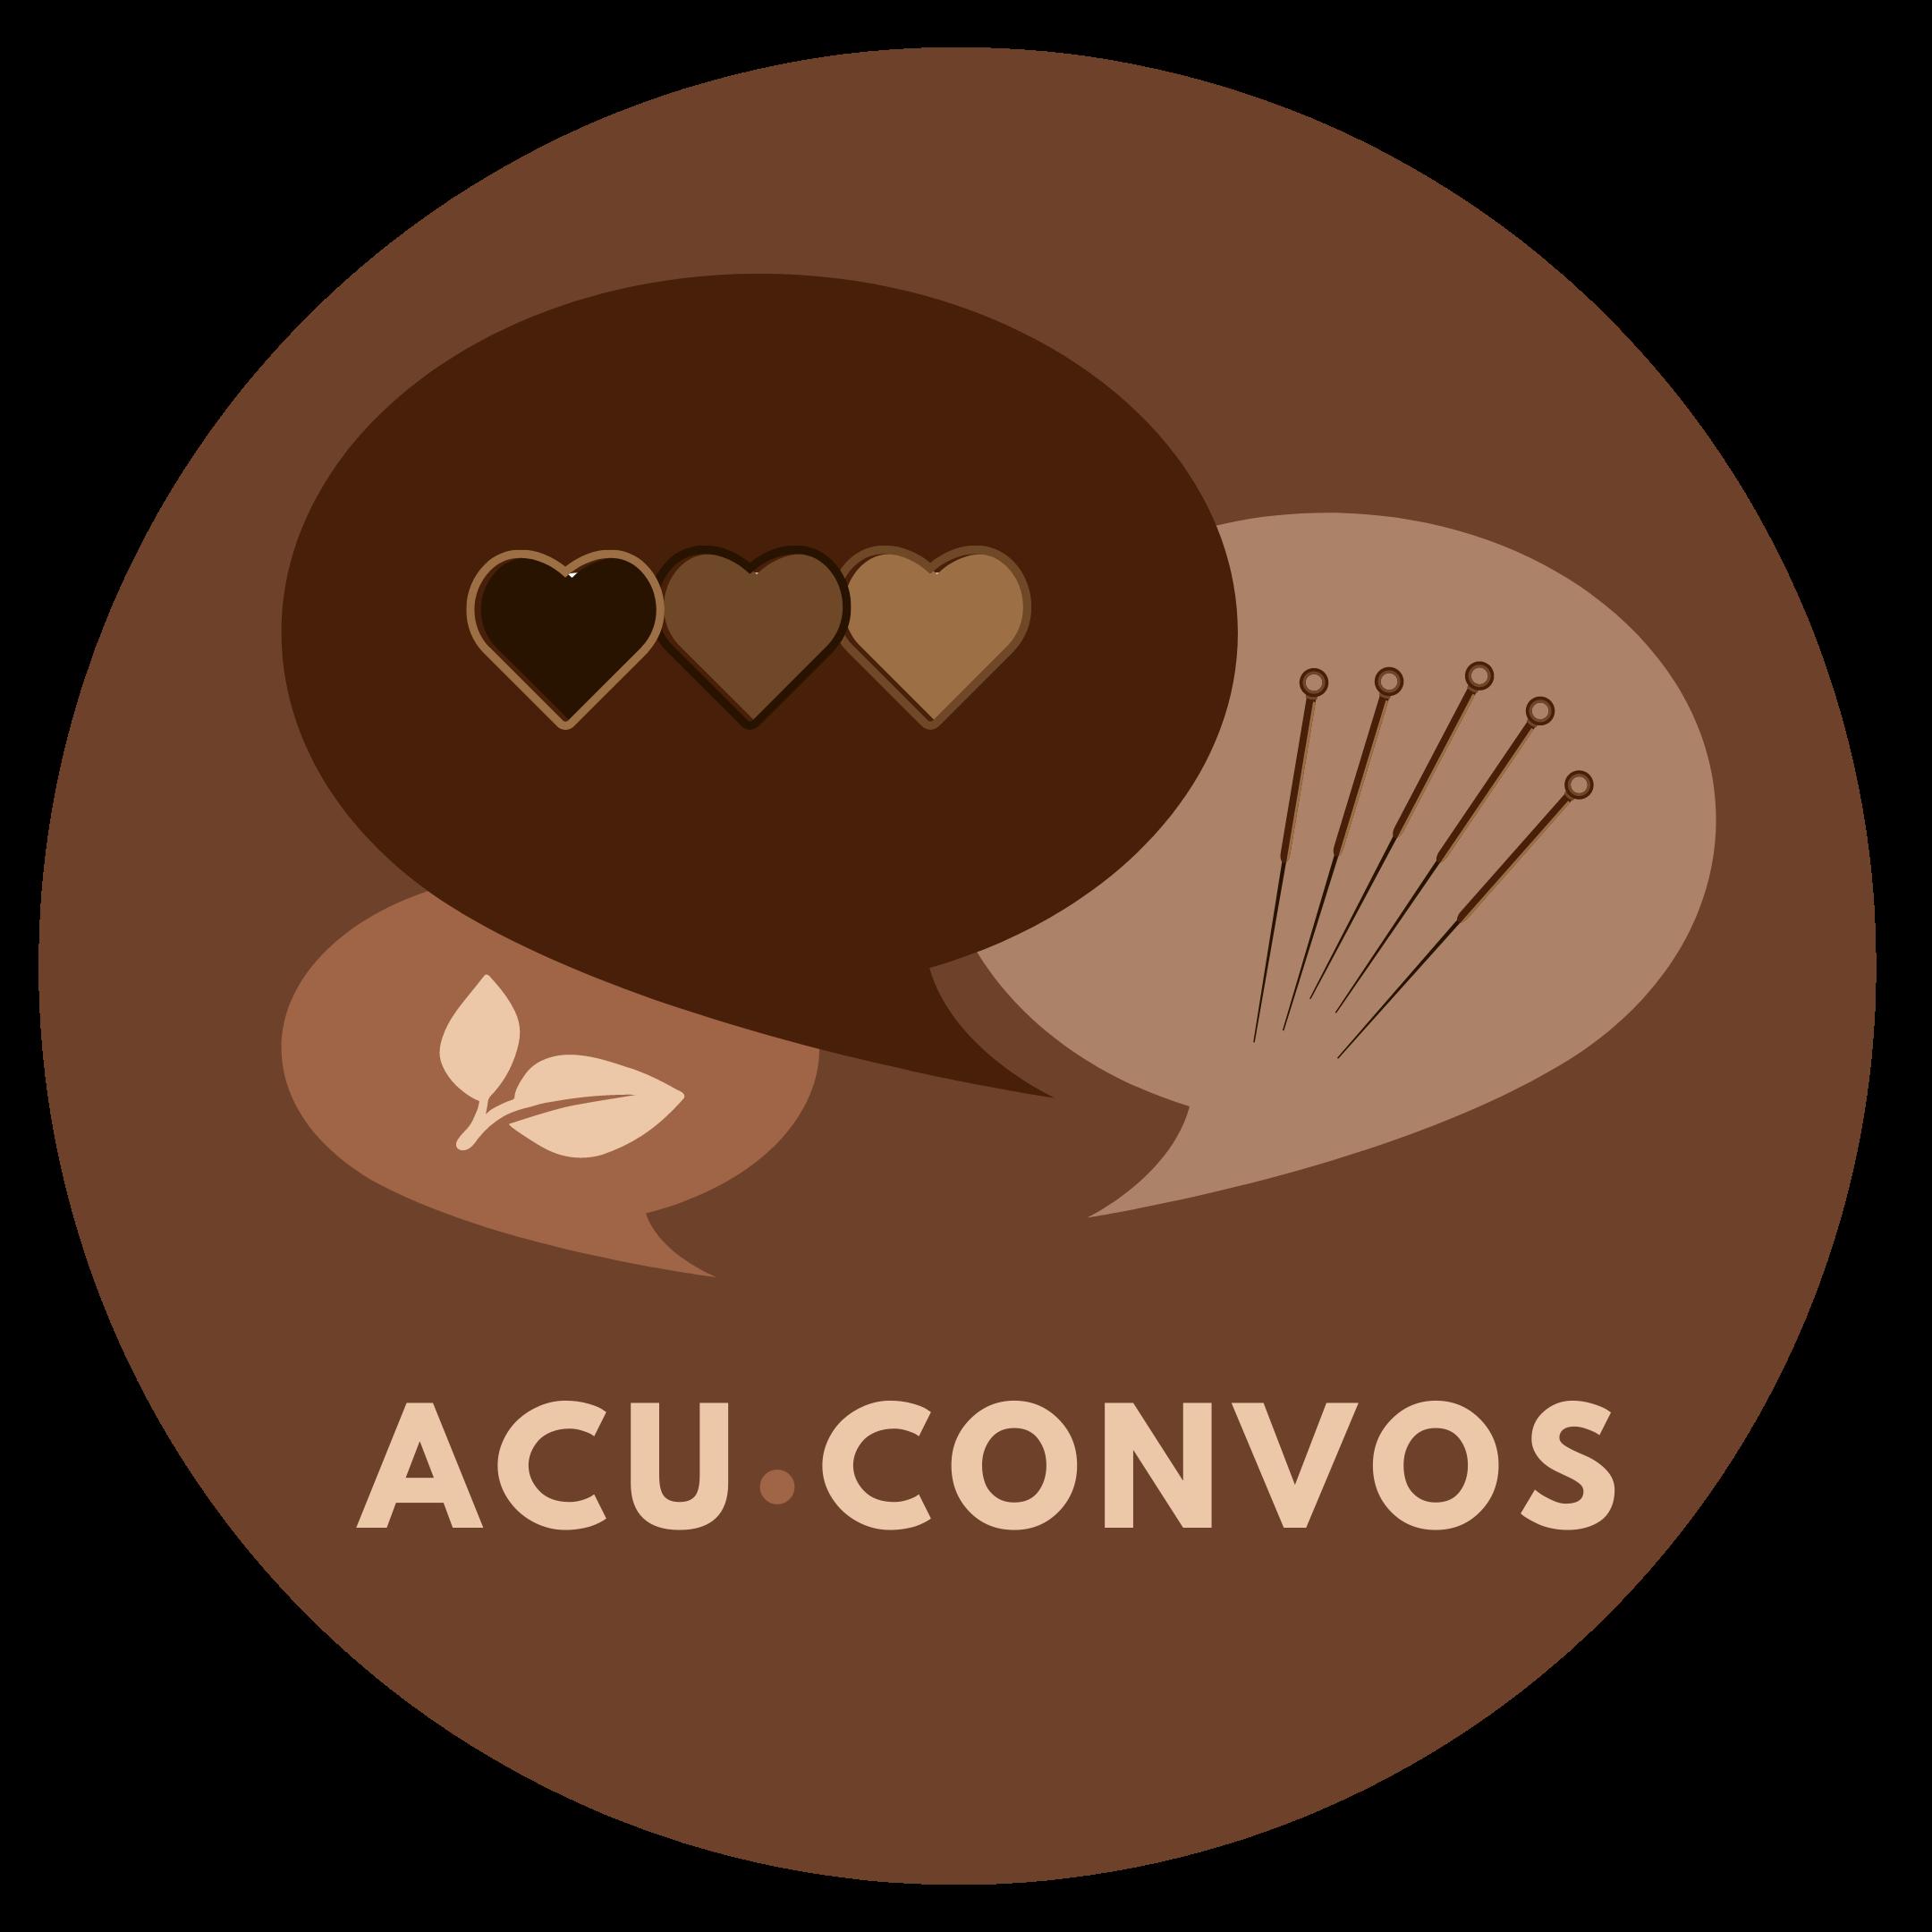 Acu·Convos